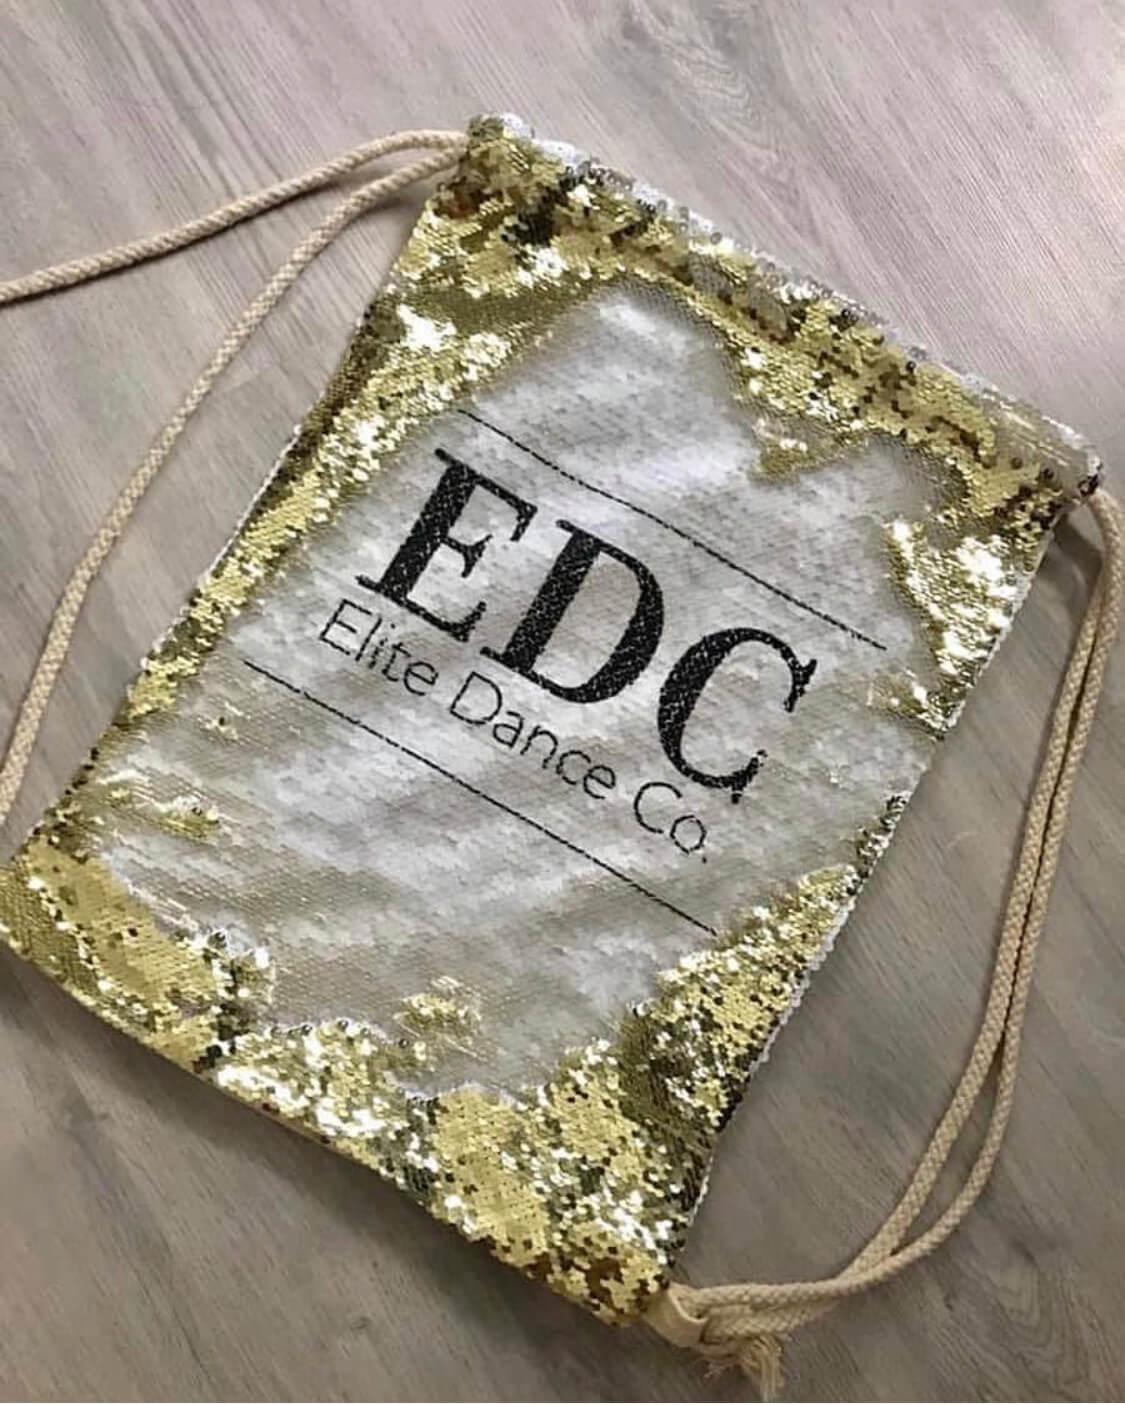 EDC Sequin Bag